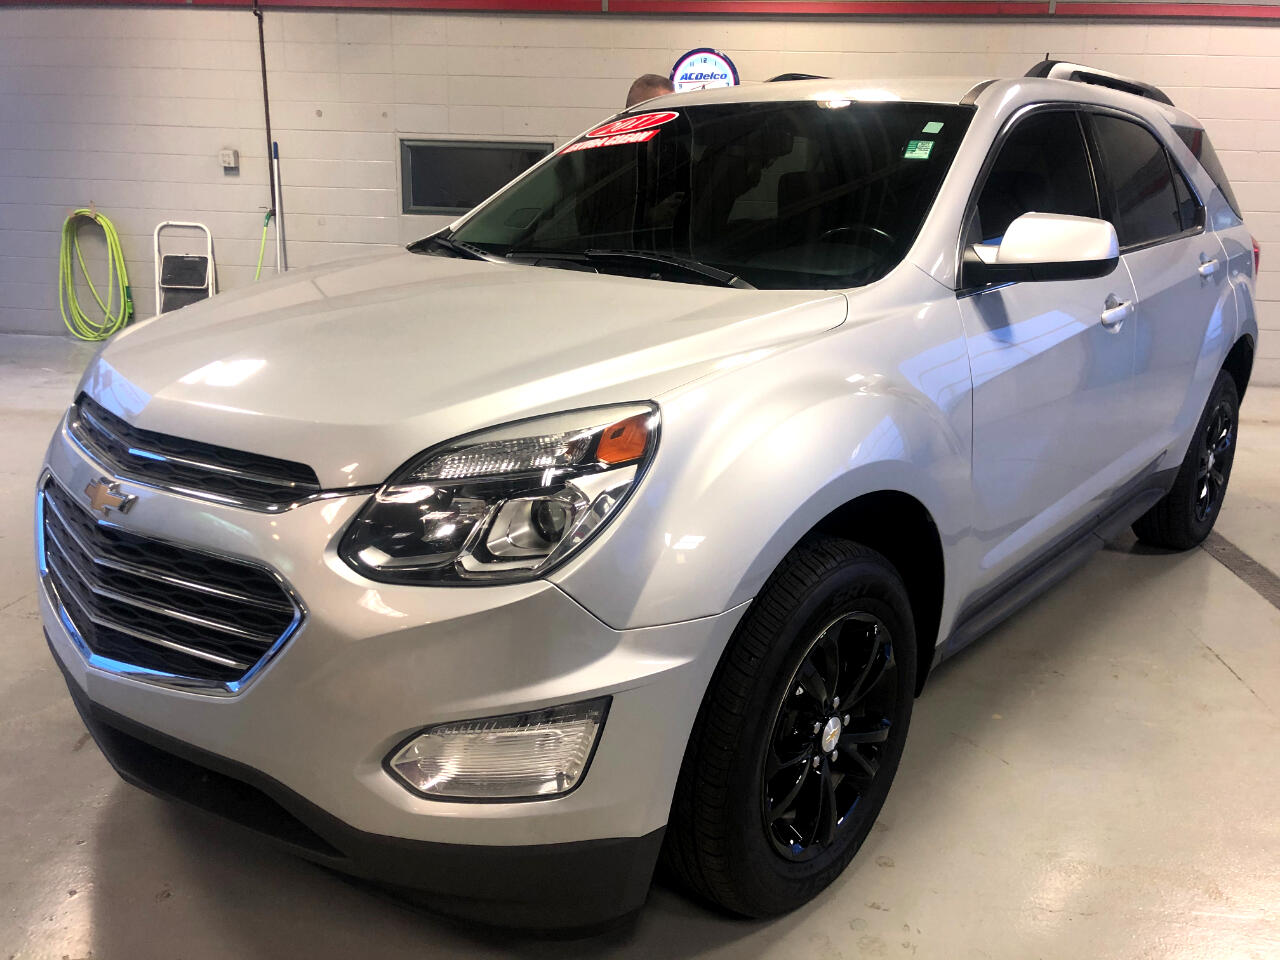 Chevrolet Equinox FWD 4dr LT w/1LT 2017